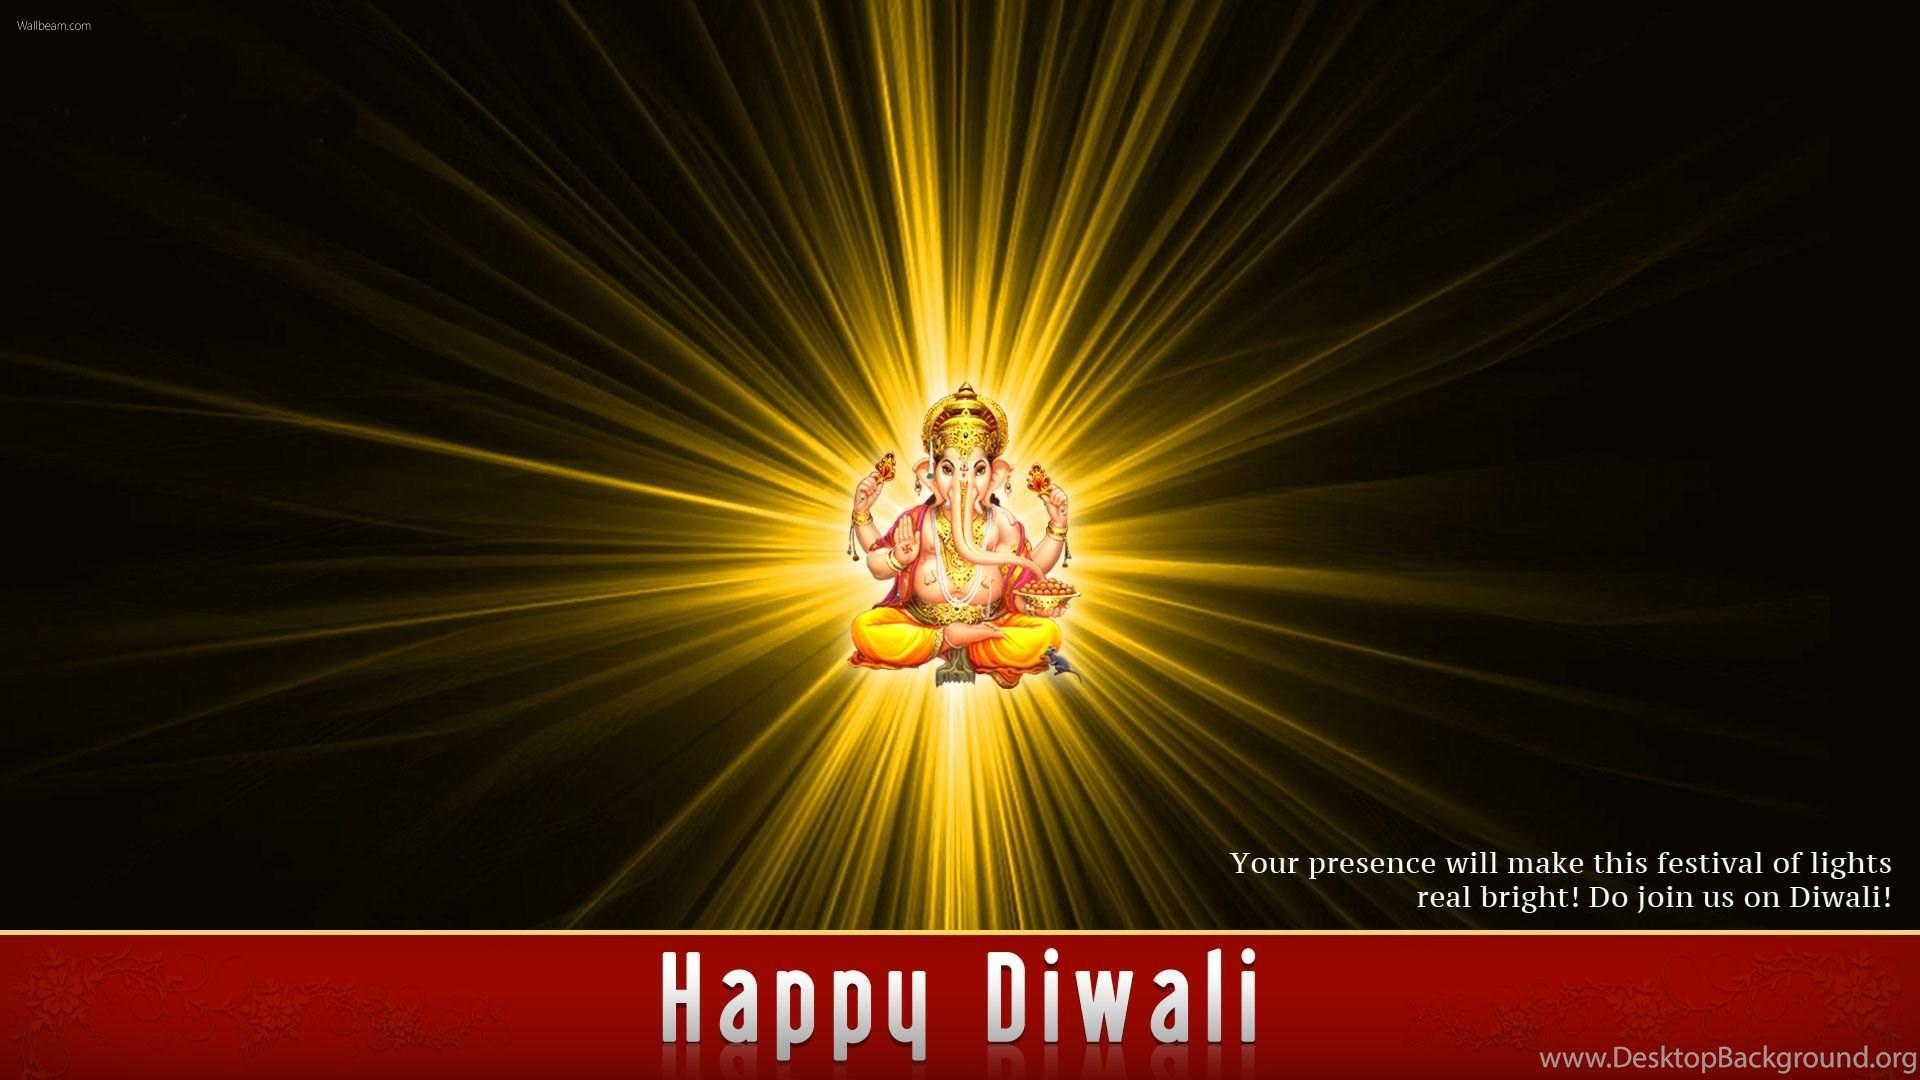 Free Download 20 Happy Diwali 2015 HD Wallpapers Desktop Background